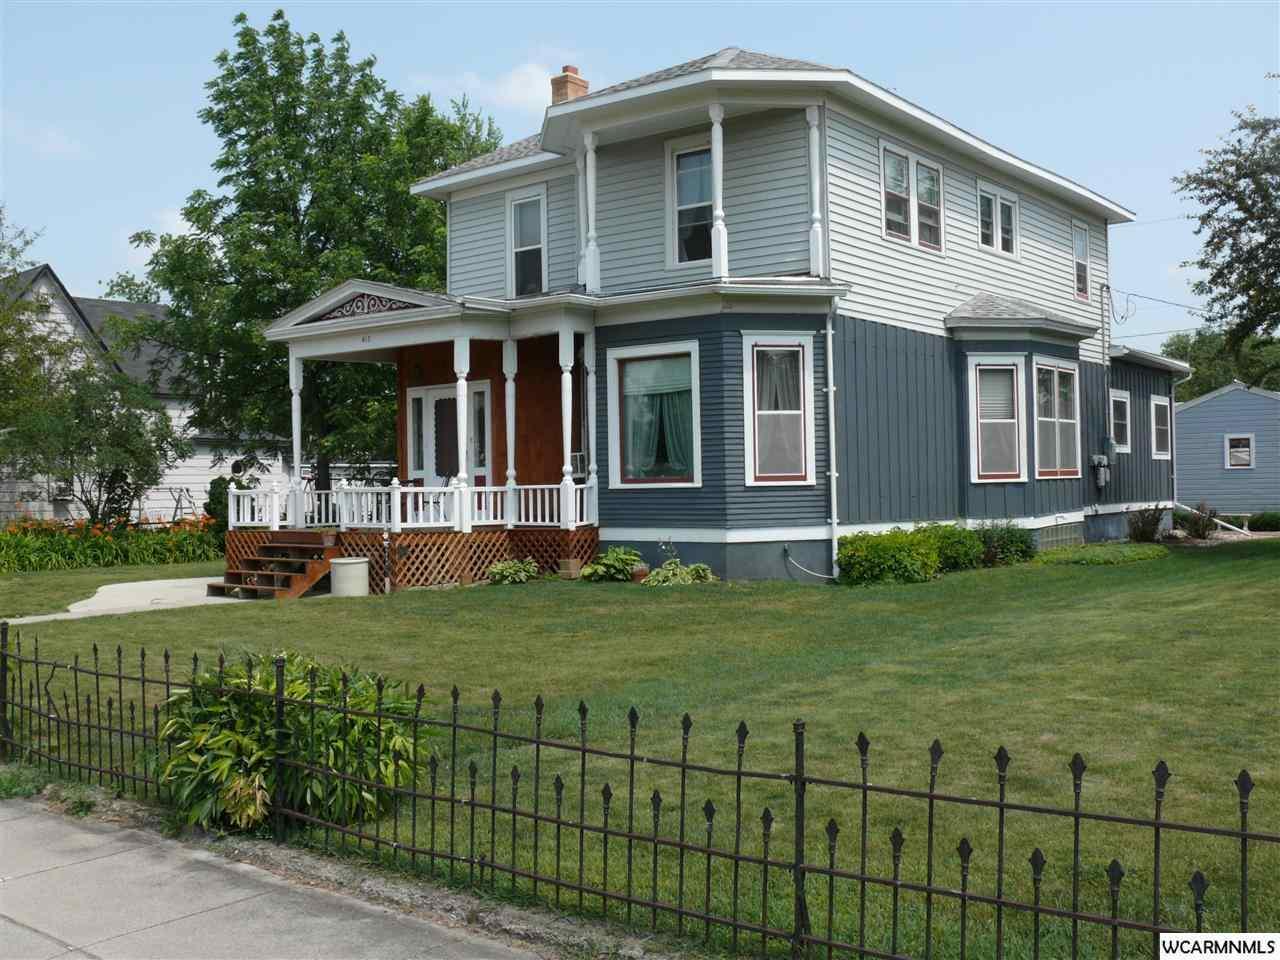 413 S 13th Street,Benson,4 Bedrooms Bedrooms,2 BathroomsBathrooms,Single Family,S 13th Street,6008146